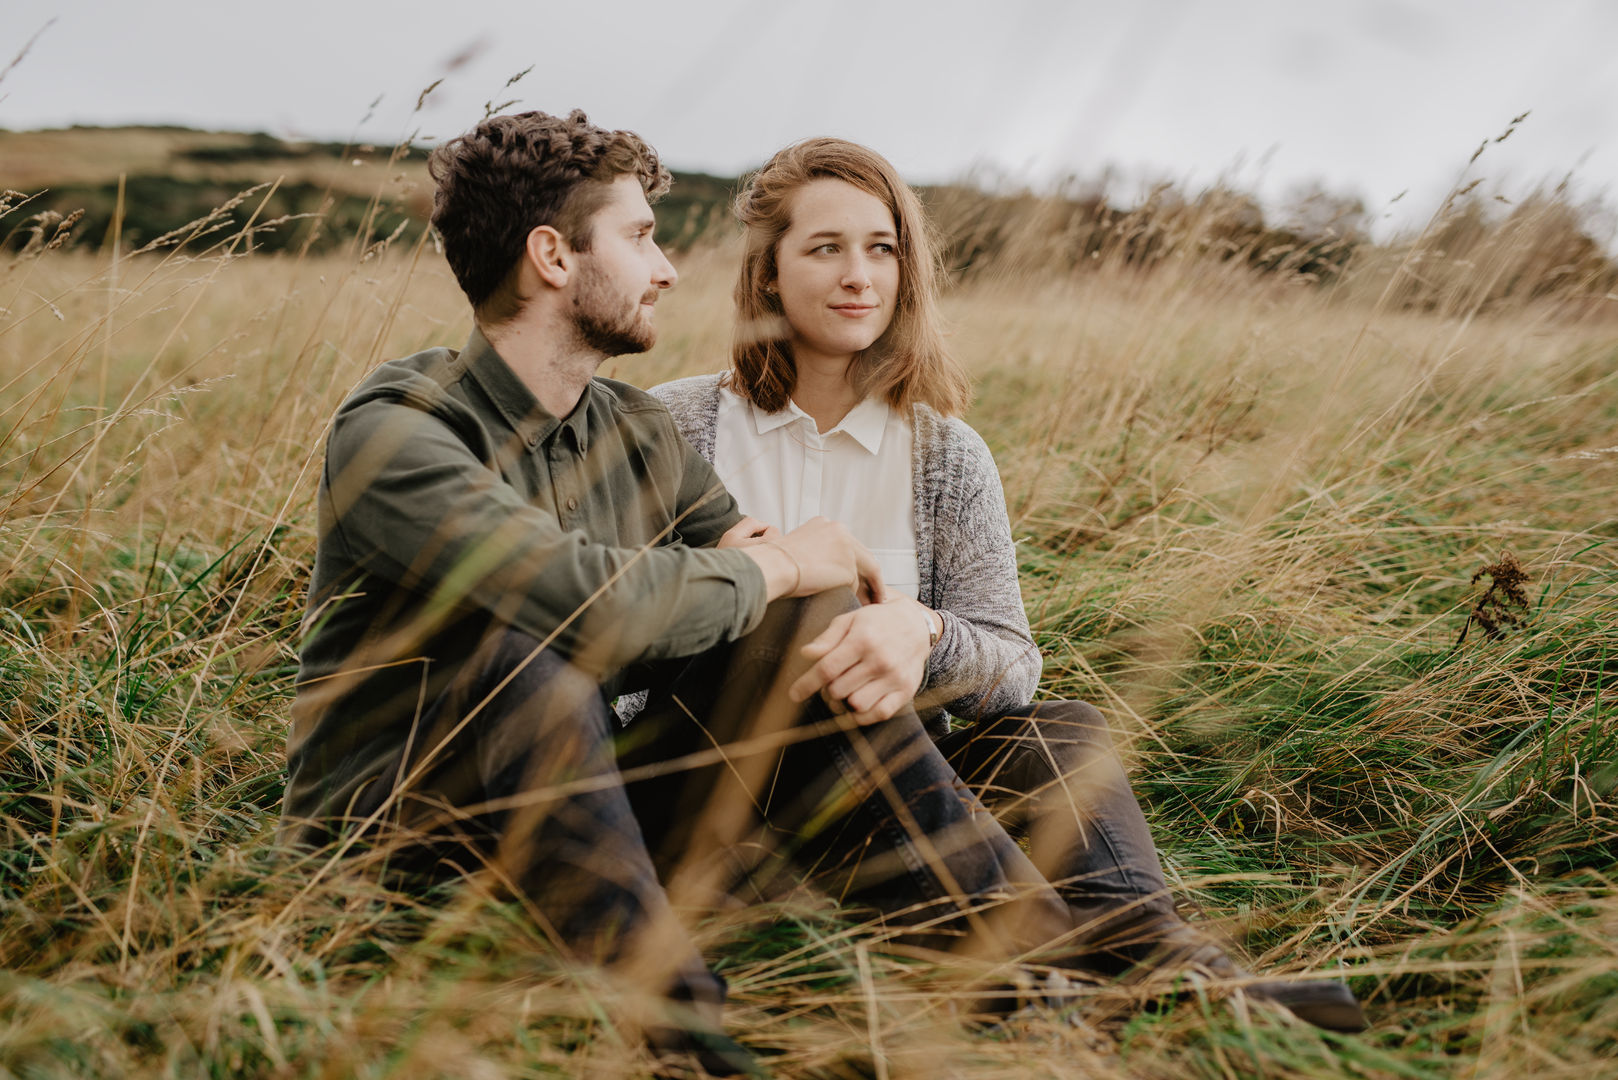 Nature Lovers couple photo-shoot in Edinburgh, Scotland